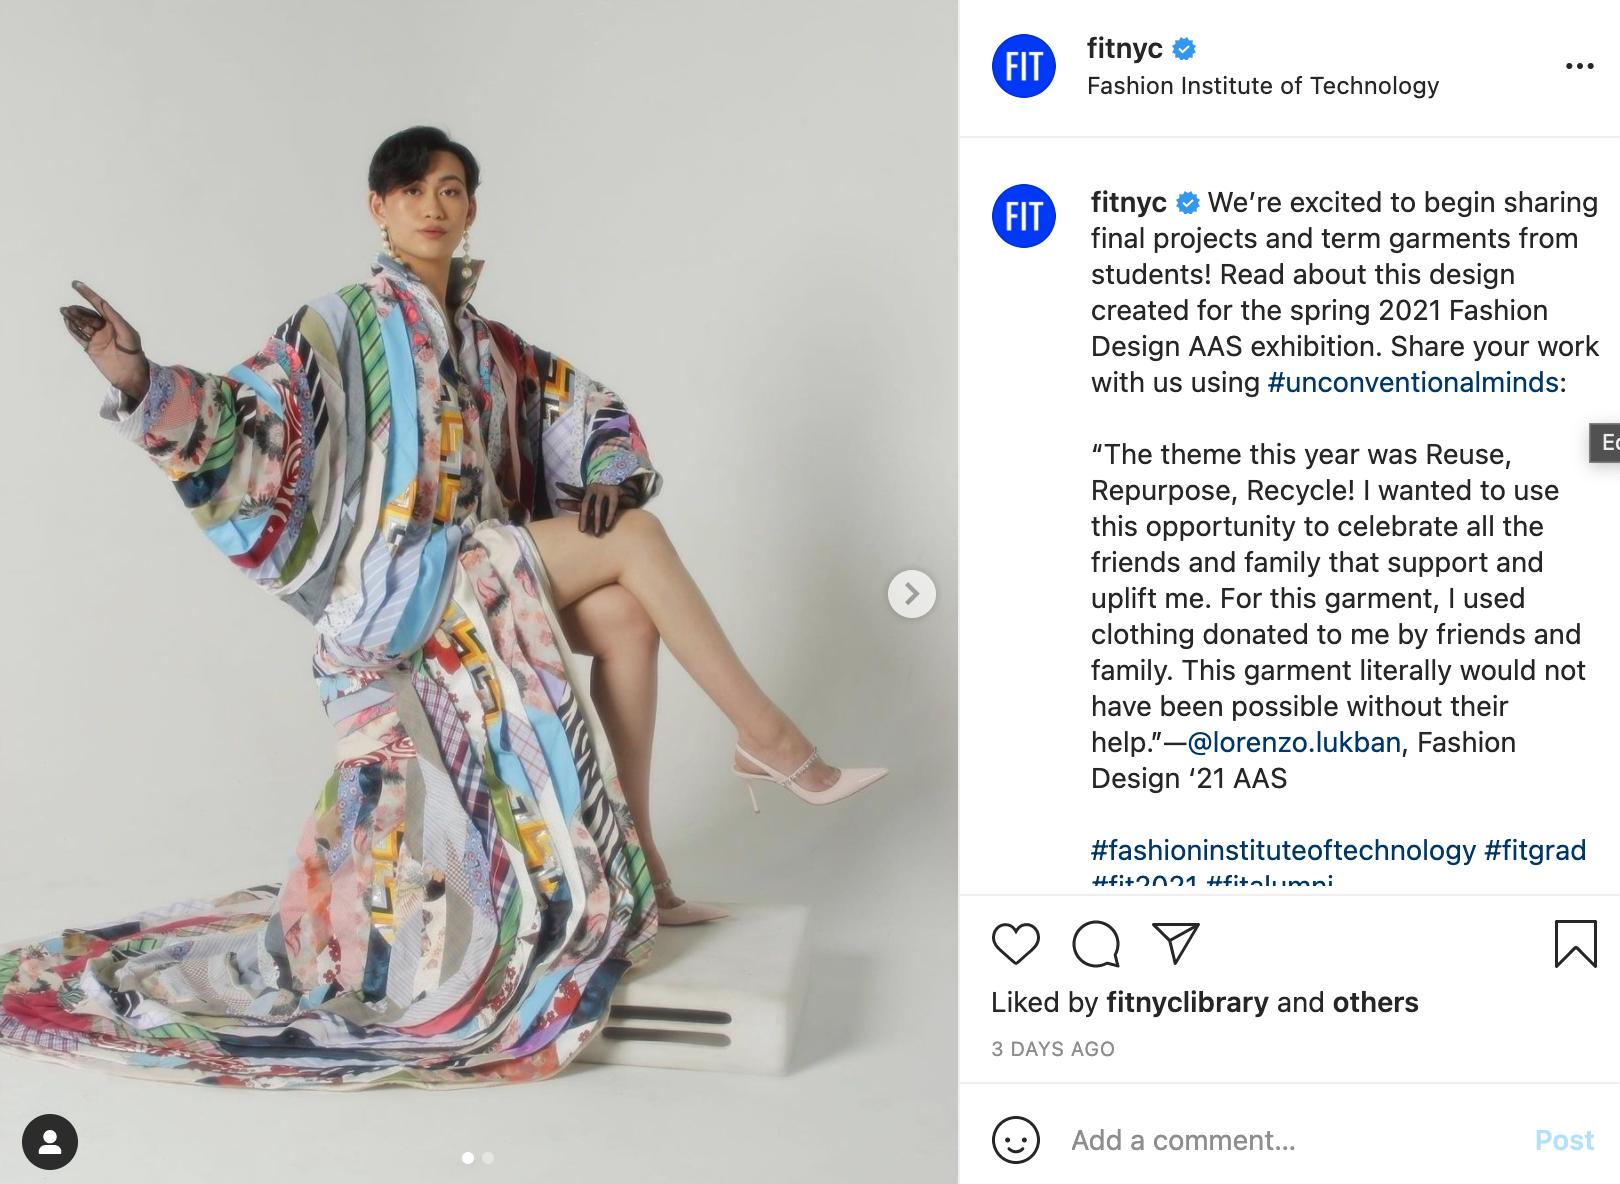 Screenshot of Instagram post featuring work by Lorenzo Lukban